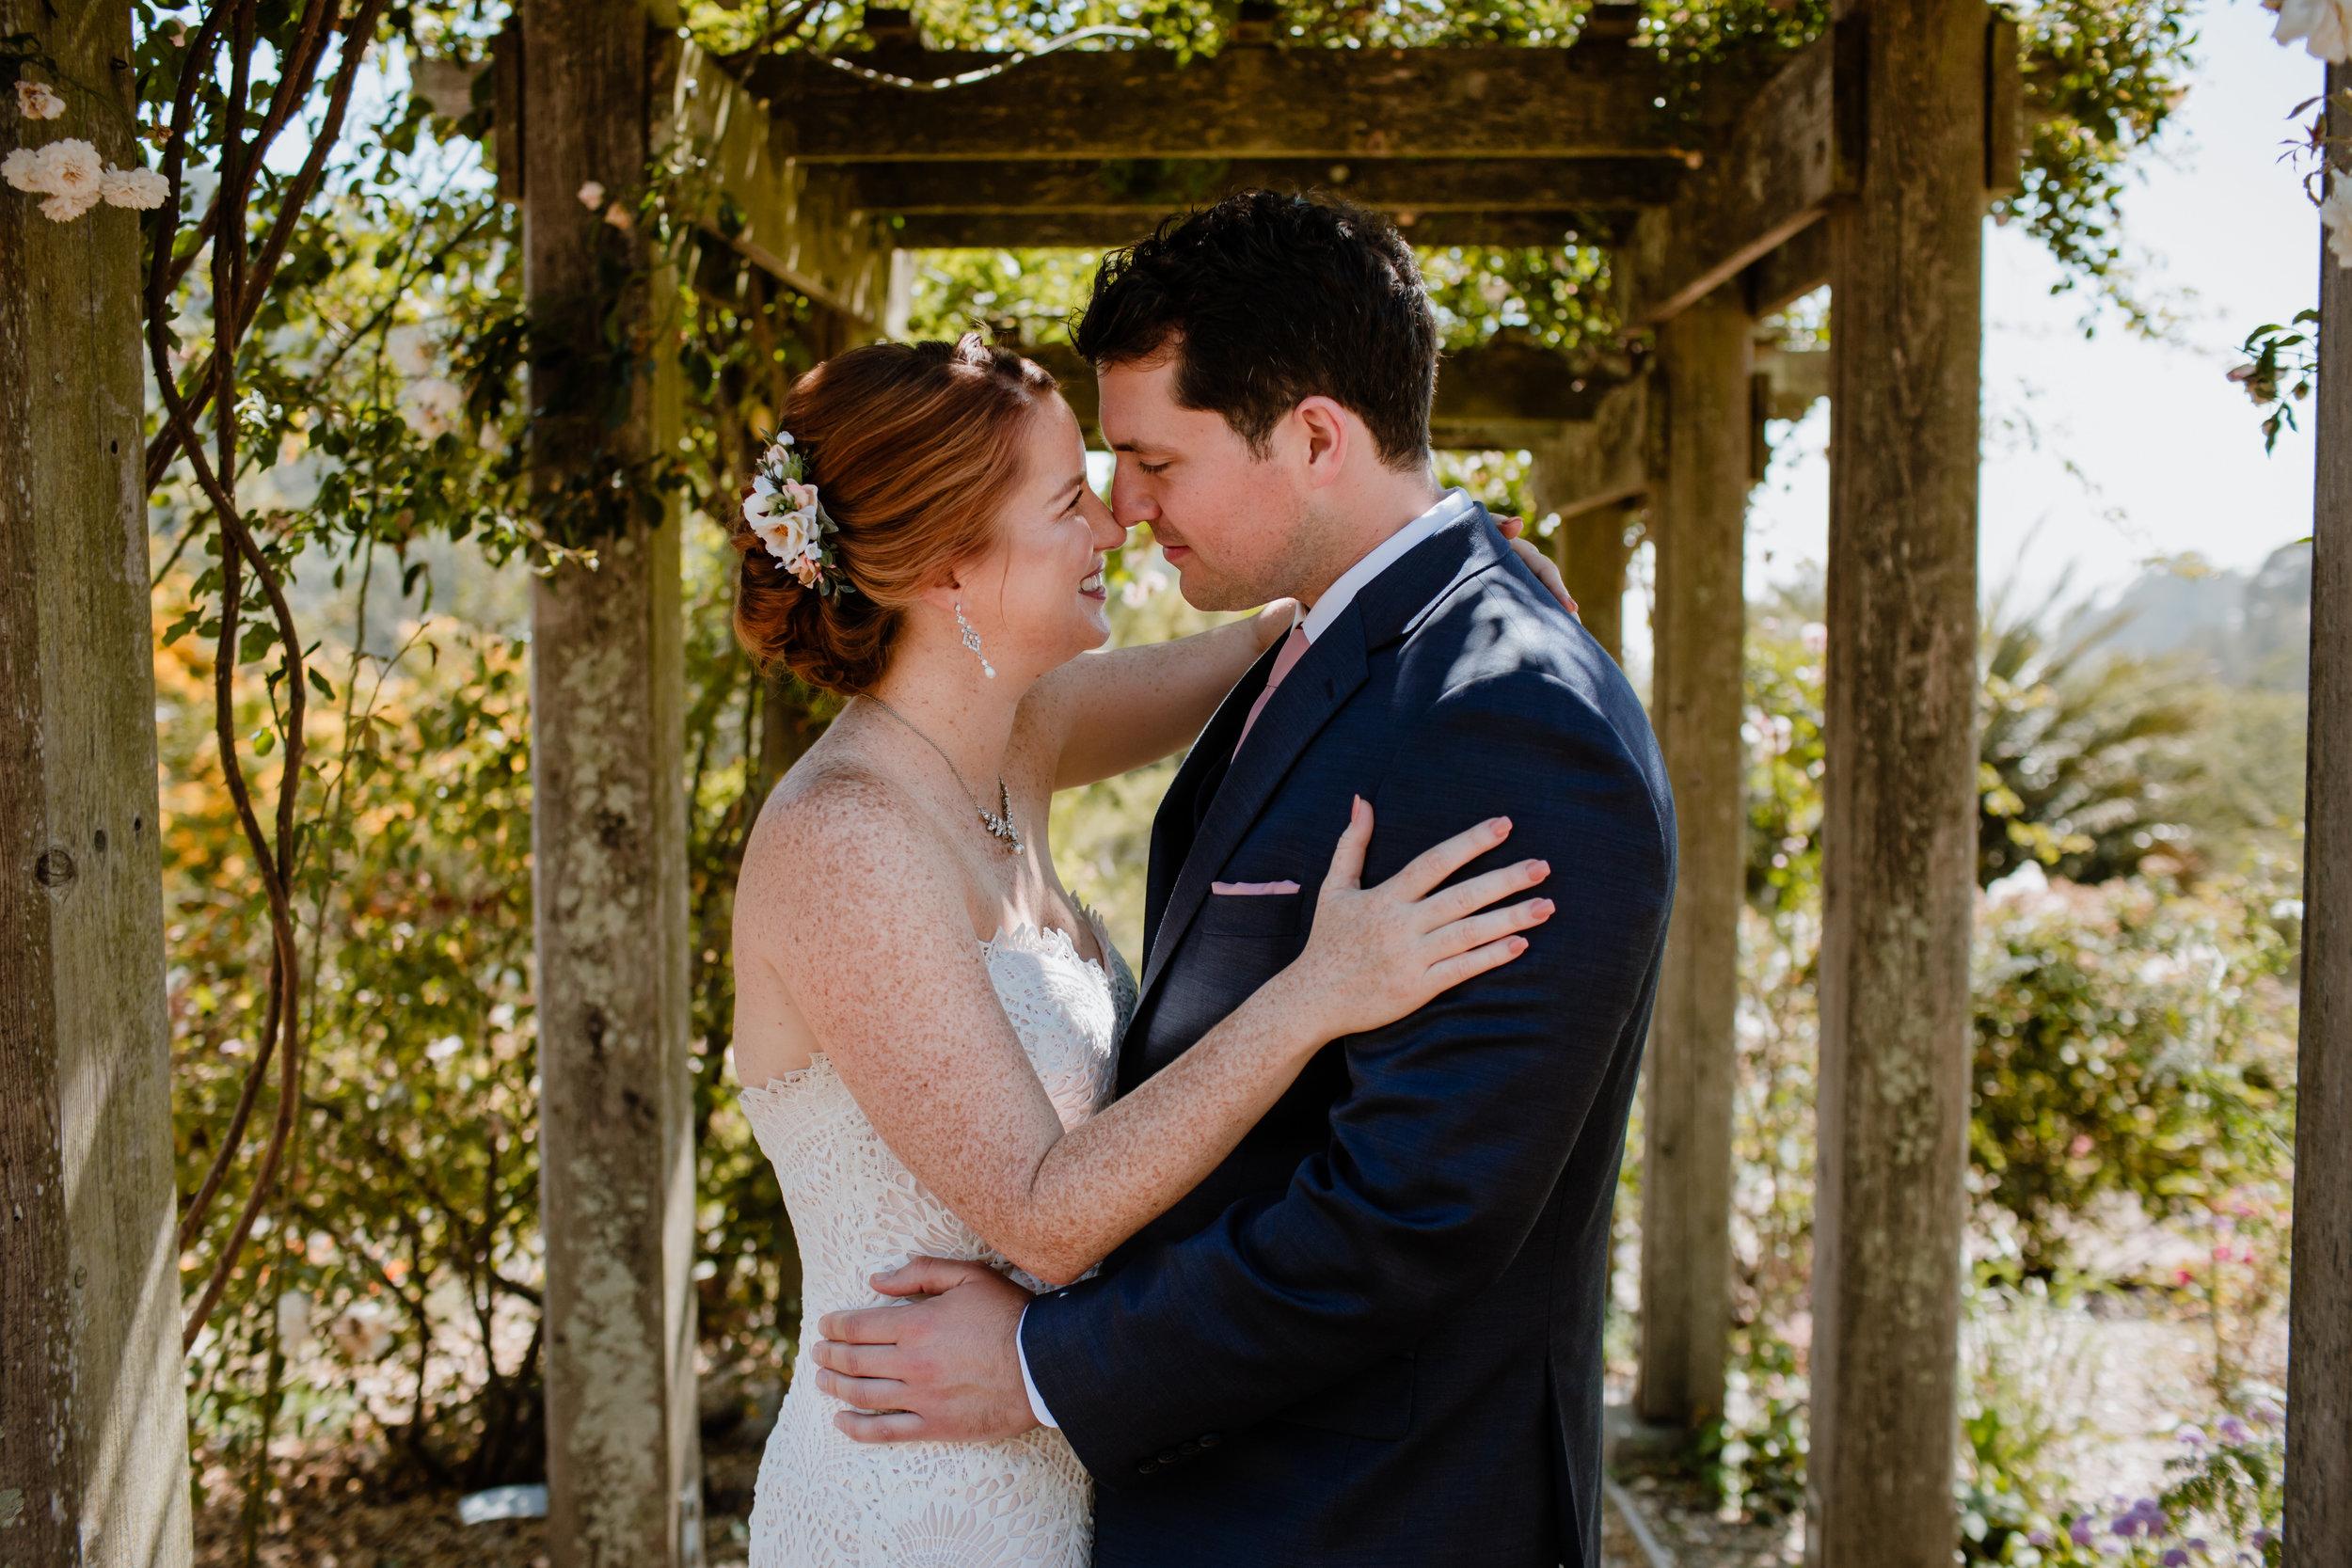 Shauna + Craig UC Berkeley Botanical Gardens Outdoor Wedding - Eve Rox Photography-14.jpg